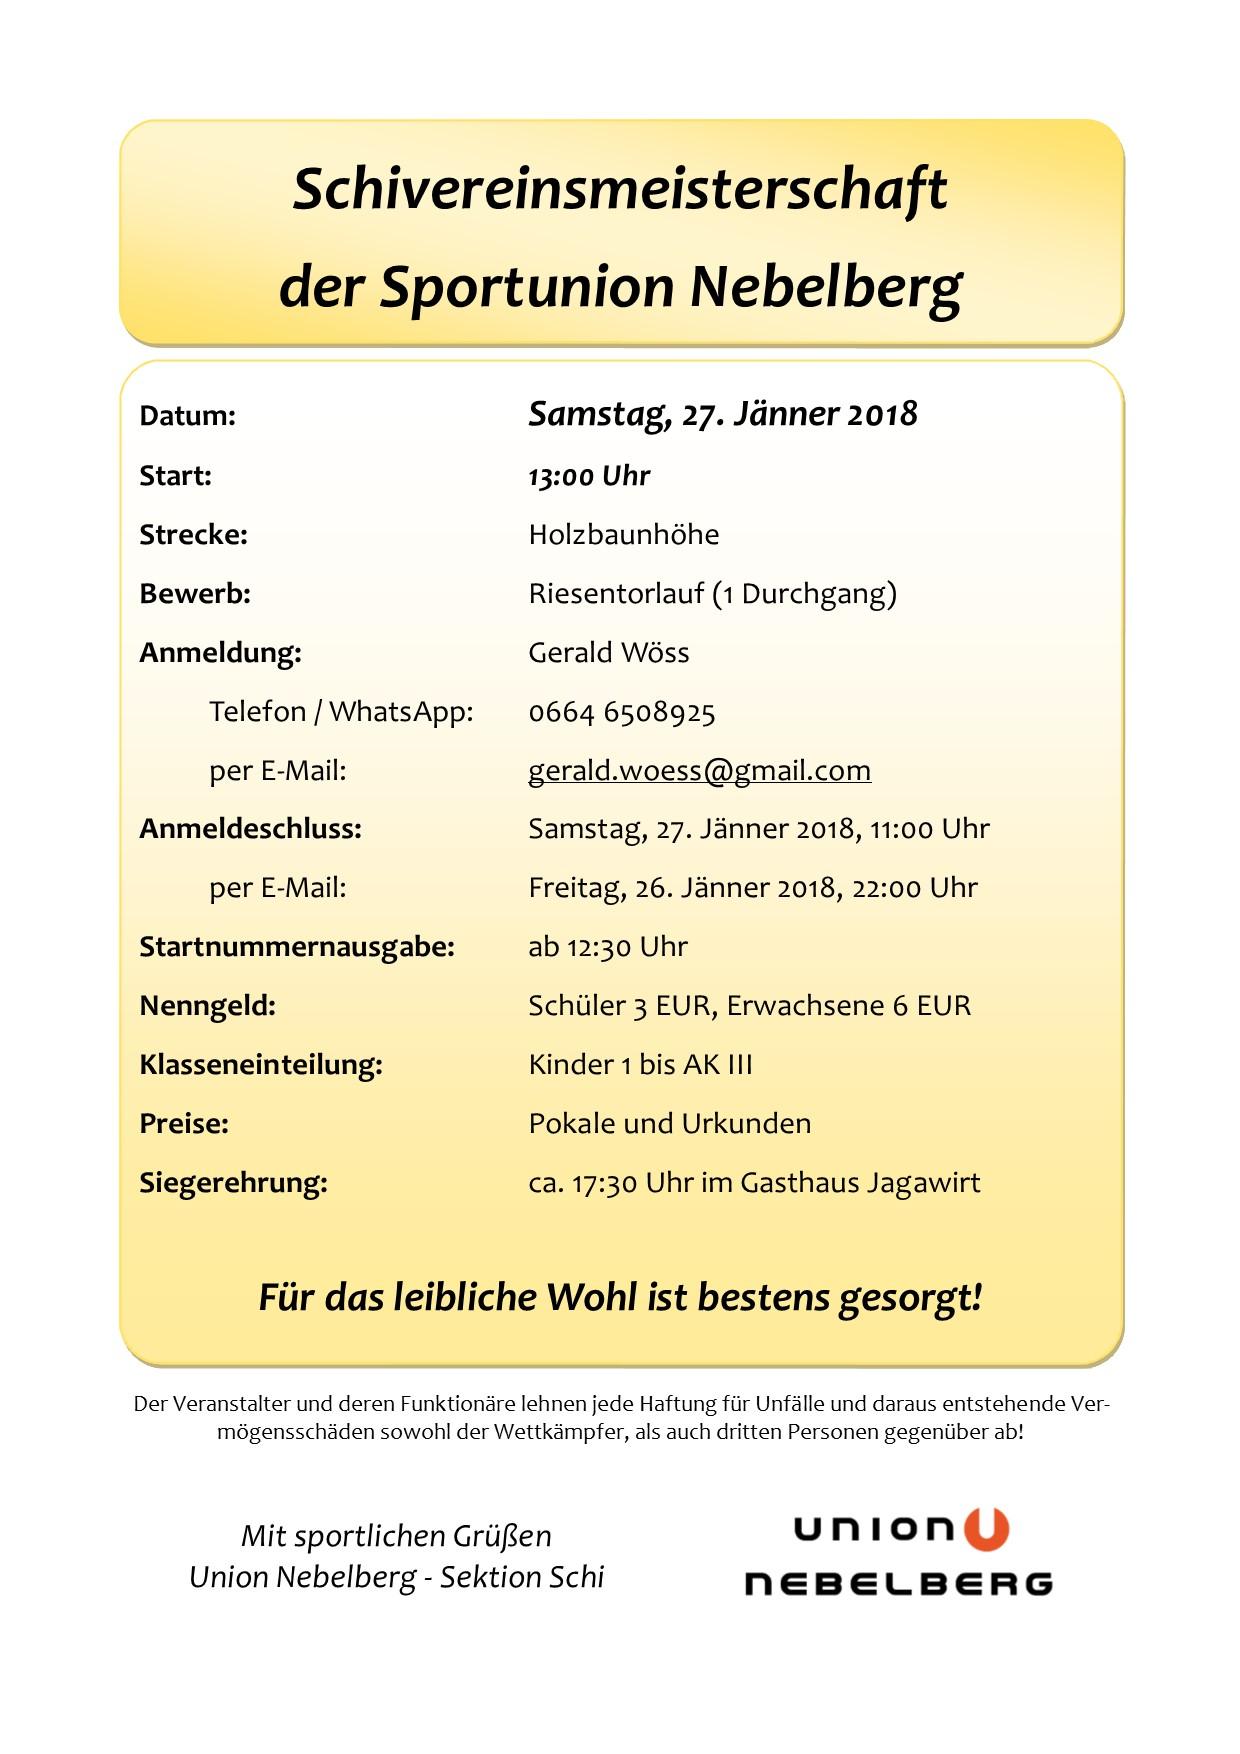 Ausschreibung Schivereinsmeisterschaft 2018